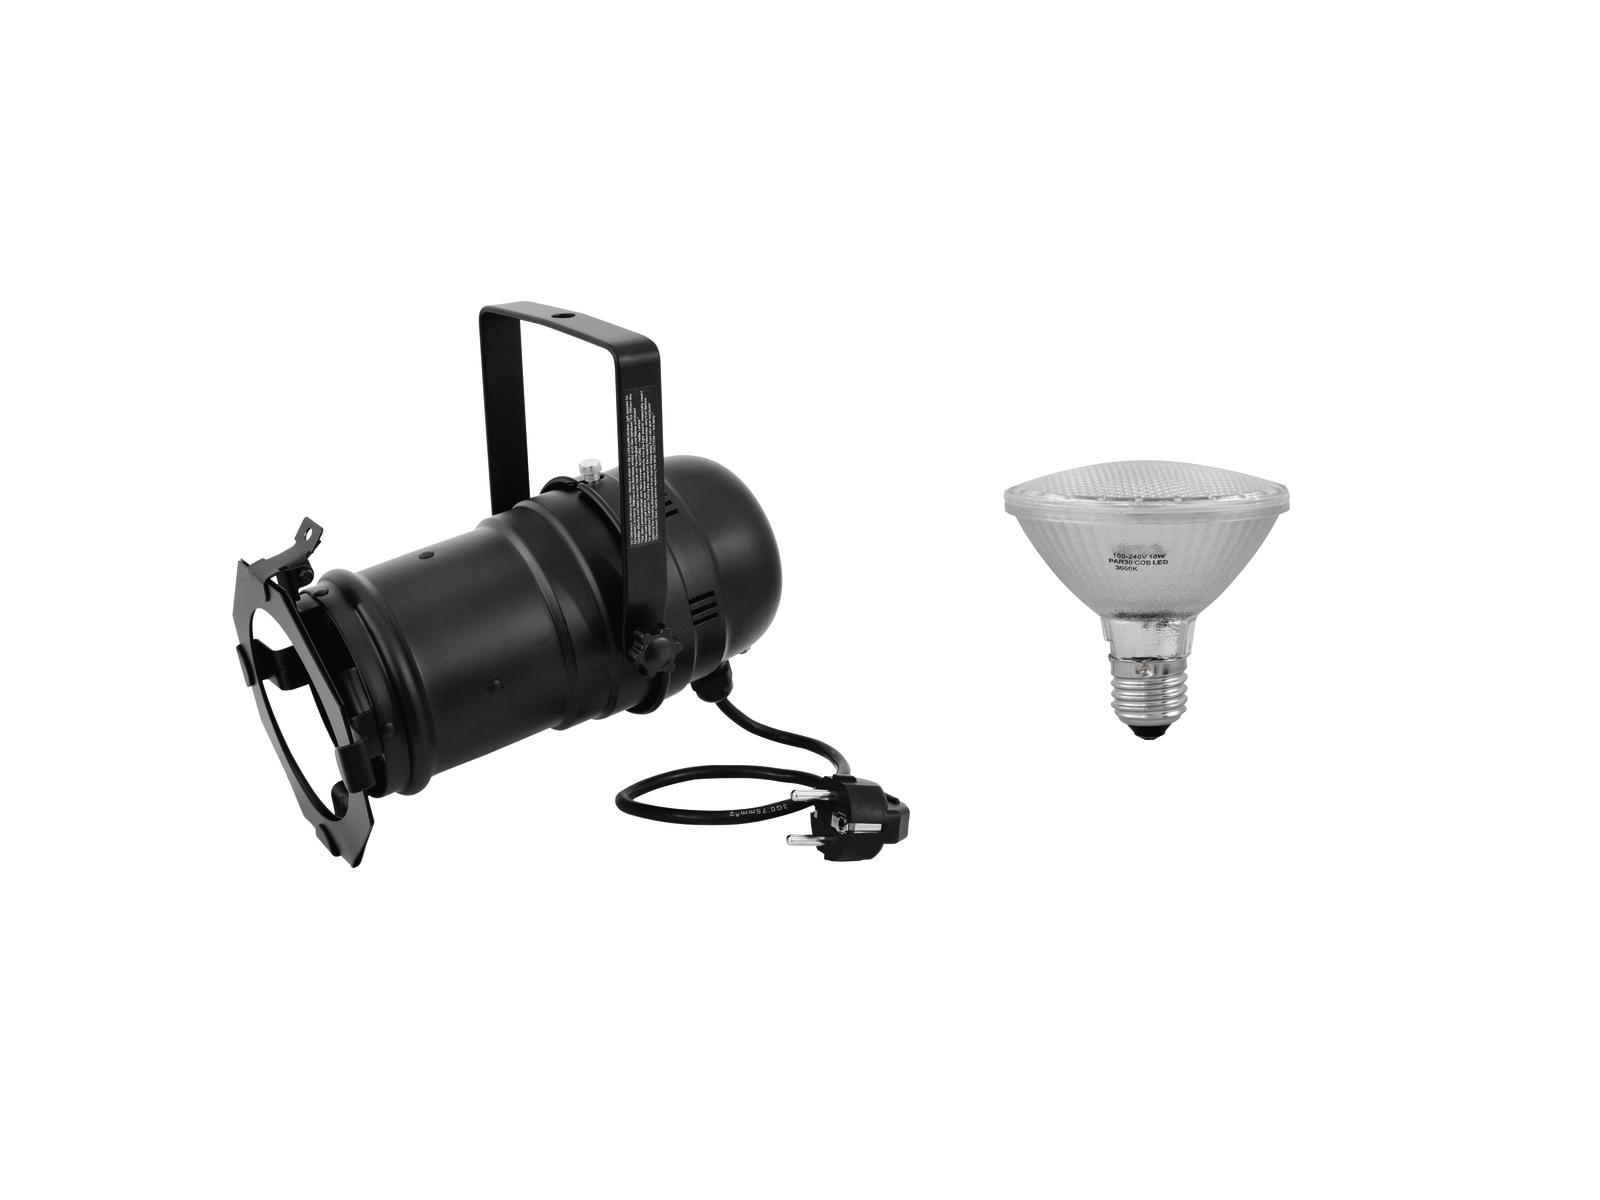 EUROLITE Impostare PAR-30 Spot bk + PAR-30 230V SMD 11W E-27 LED 3000K